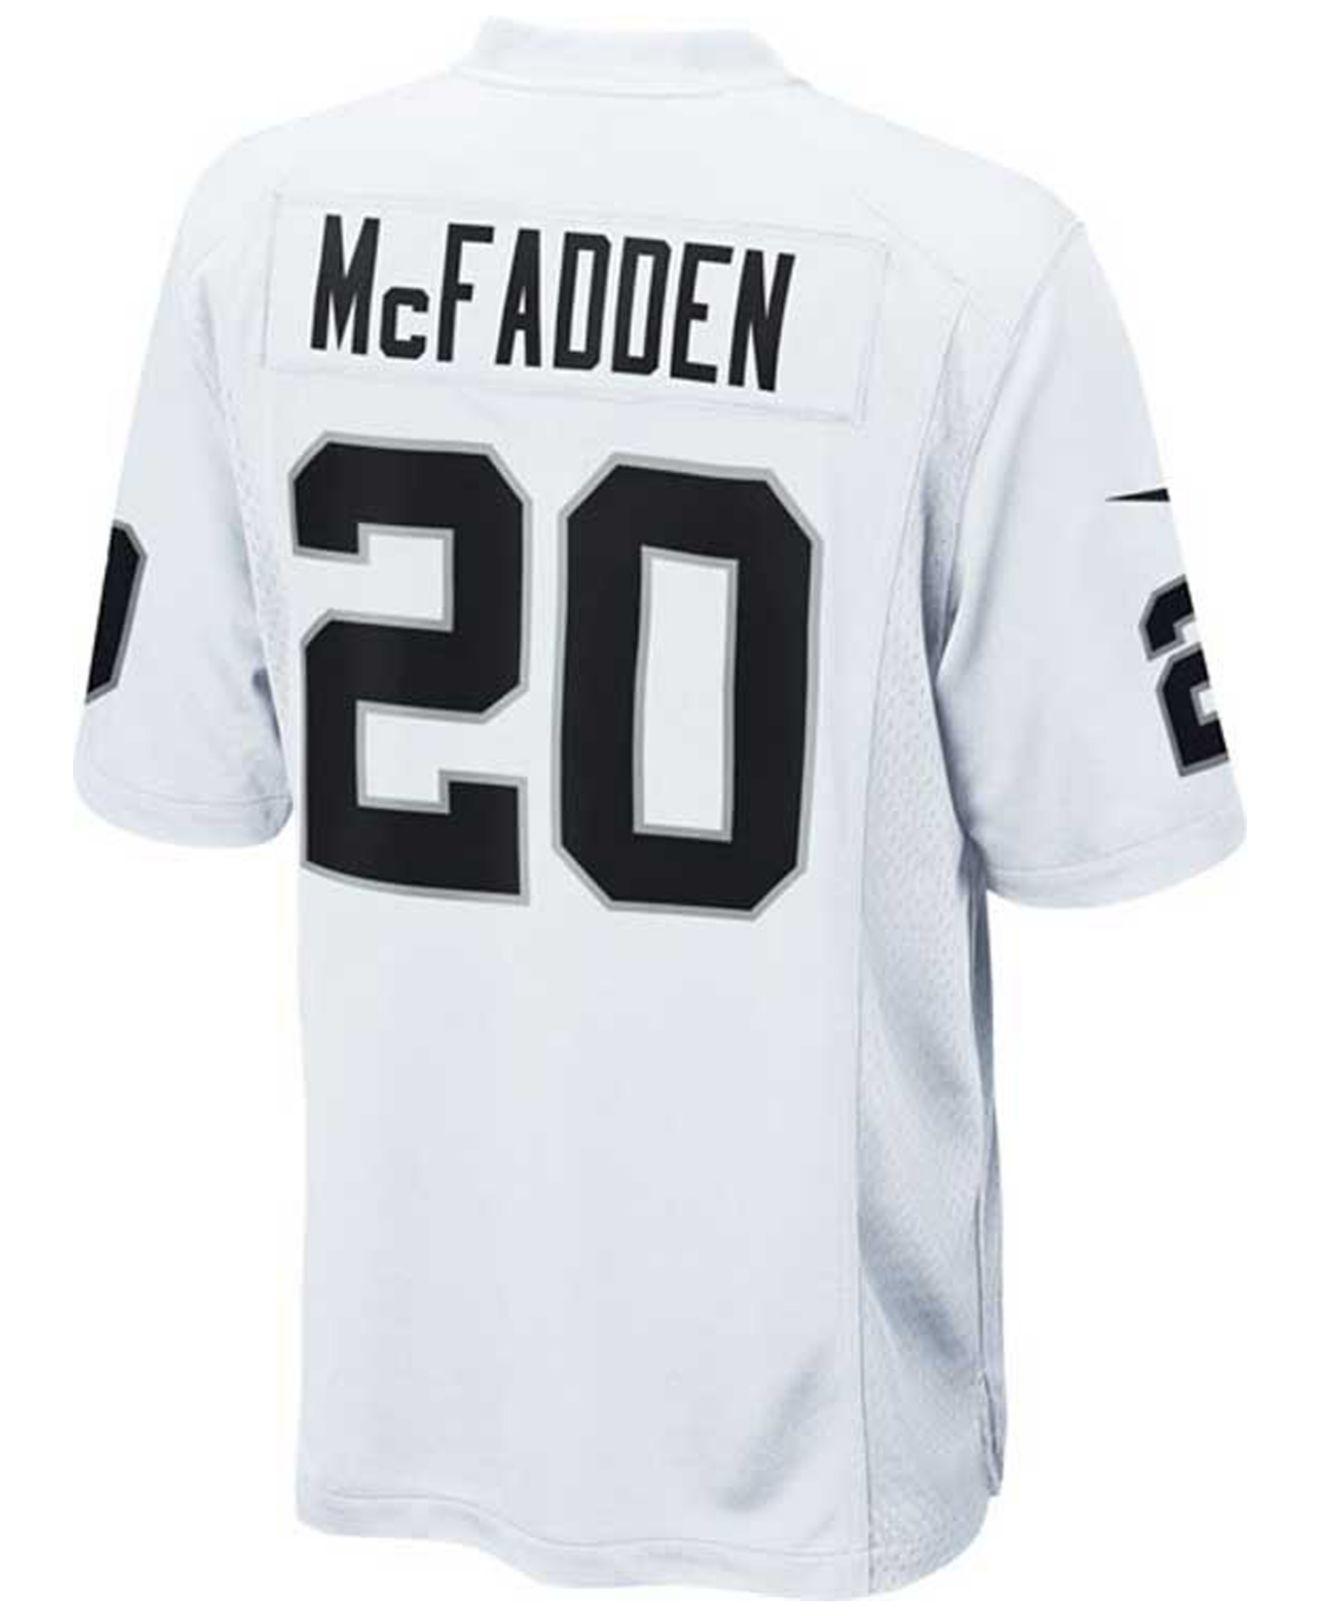 661cfd1ad ... 20 darren mcfadden limited black impact nfl jersey c6a34 4d5fe  store  lyst nike kids darren mcfadden oakland raiders jersey in white 3e563 5e300